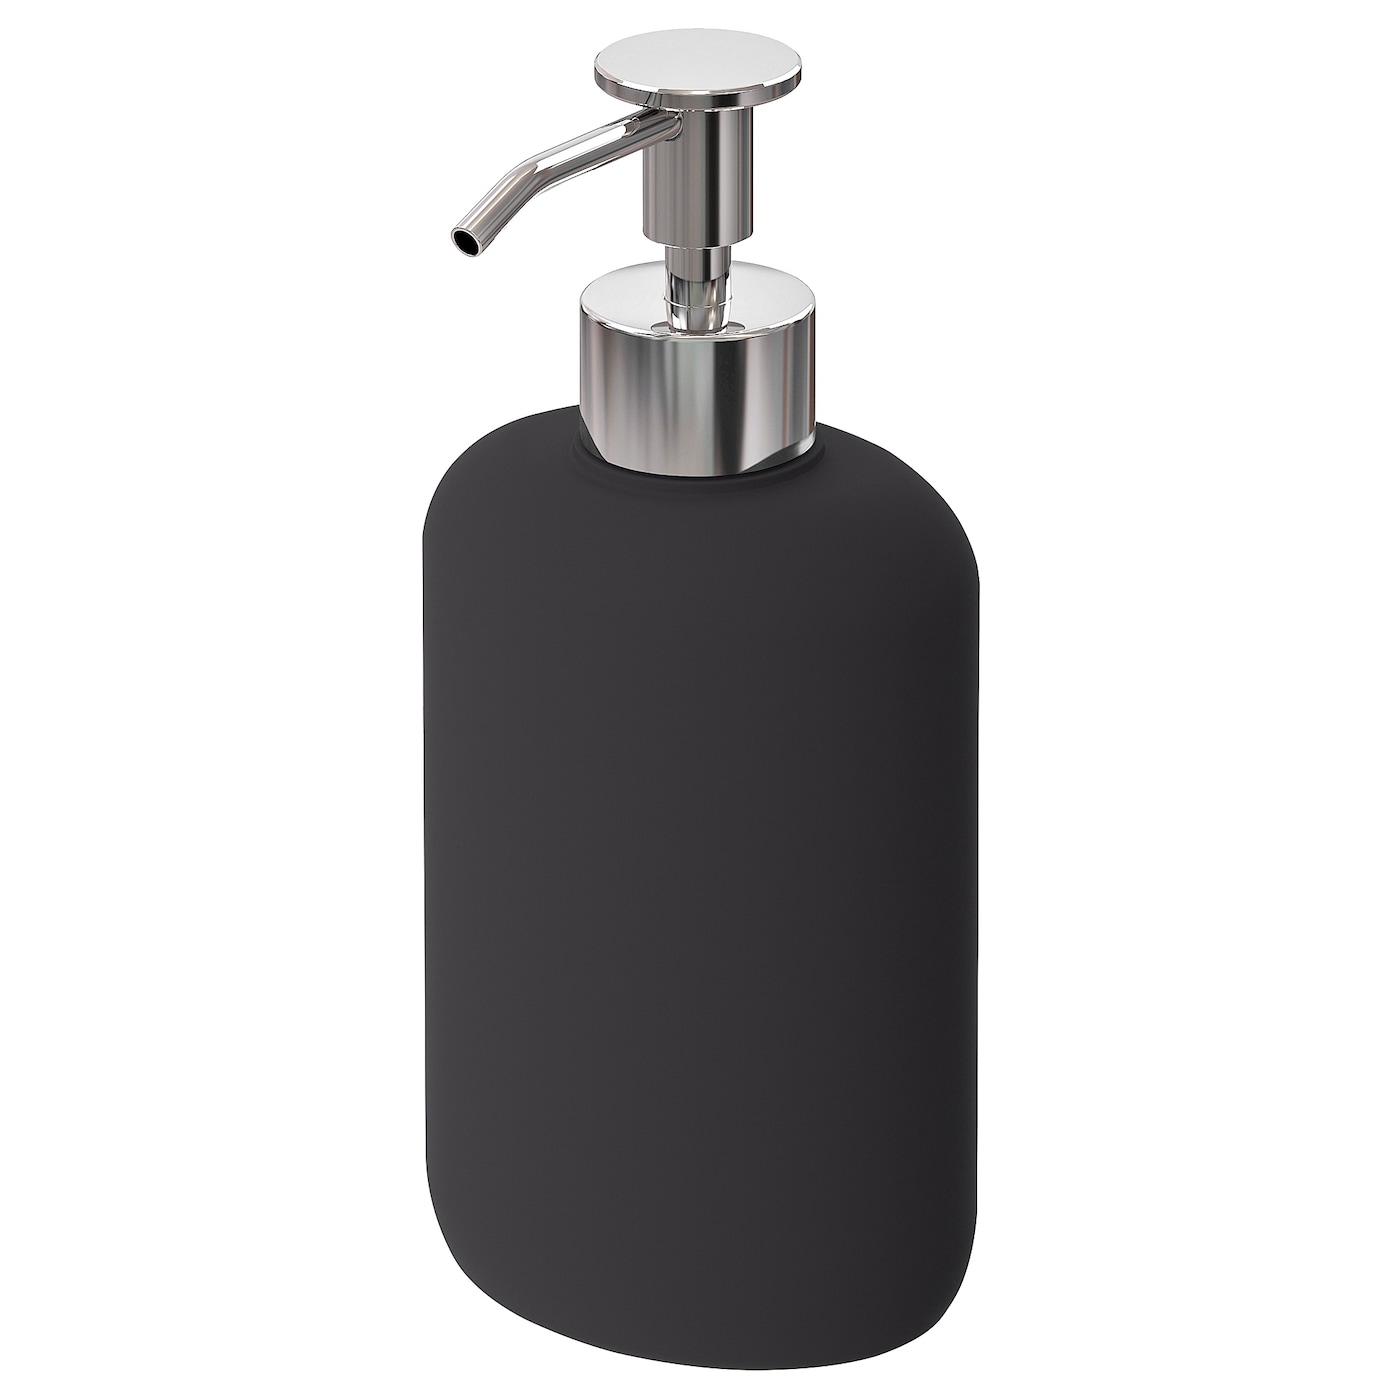 EKOLN Dispensador jabón gris oscuro